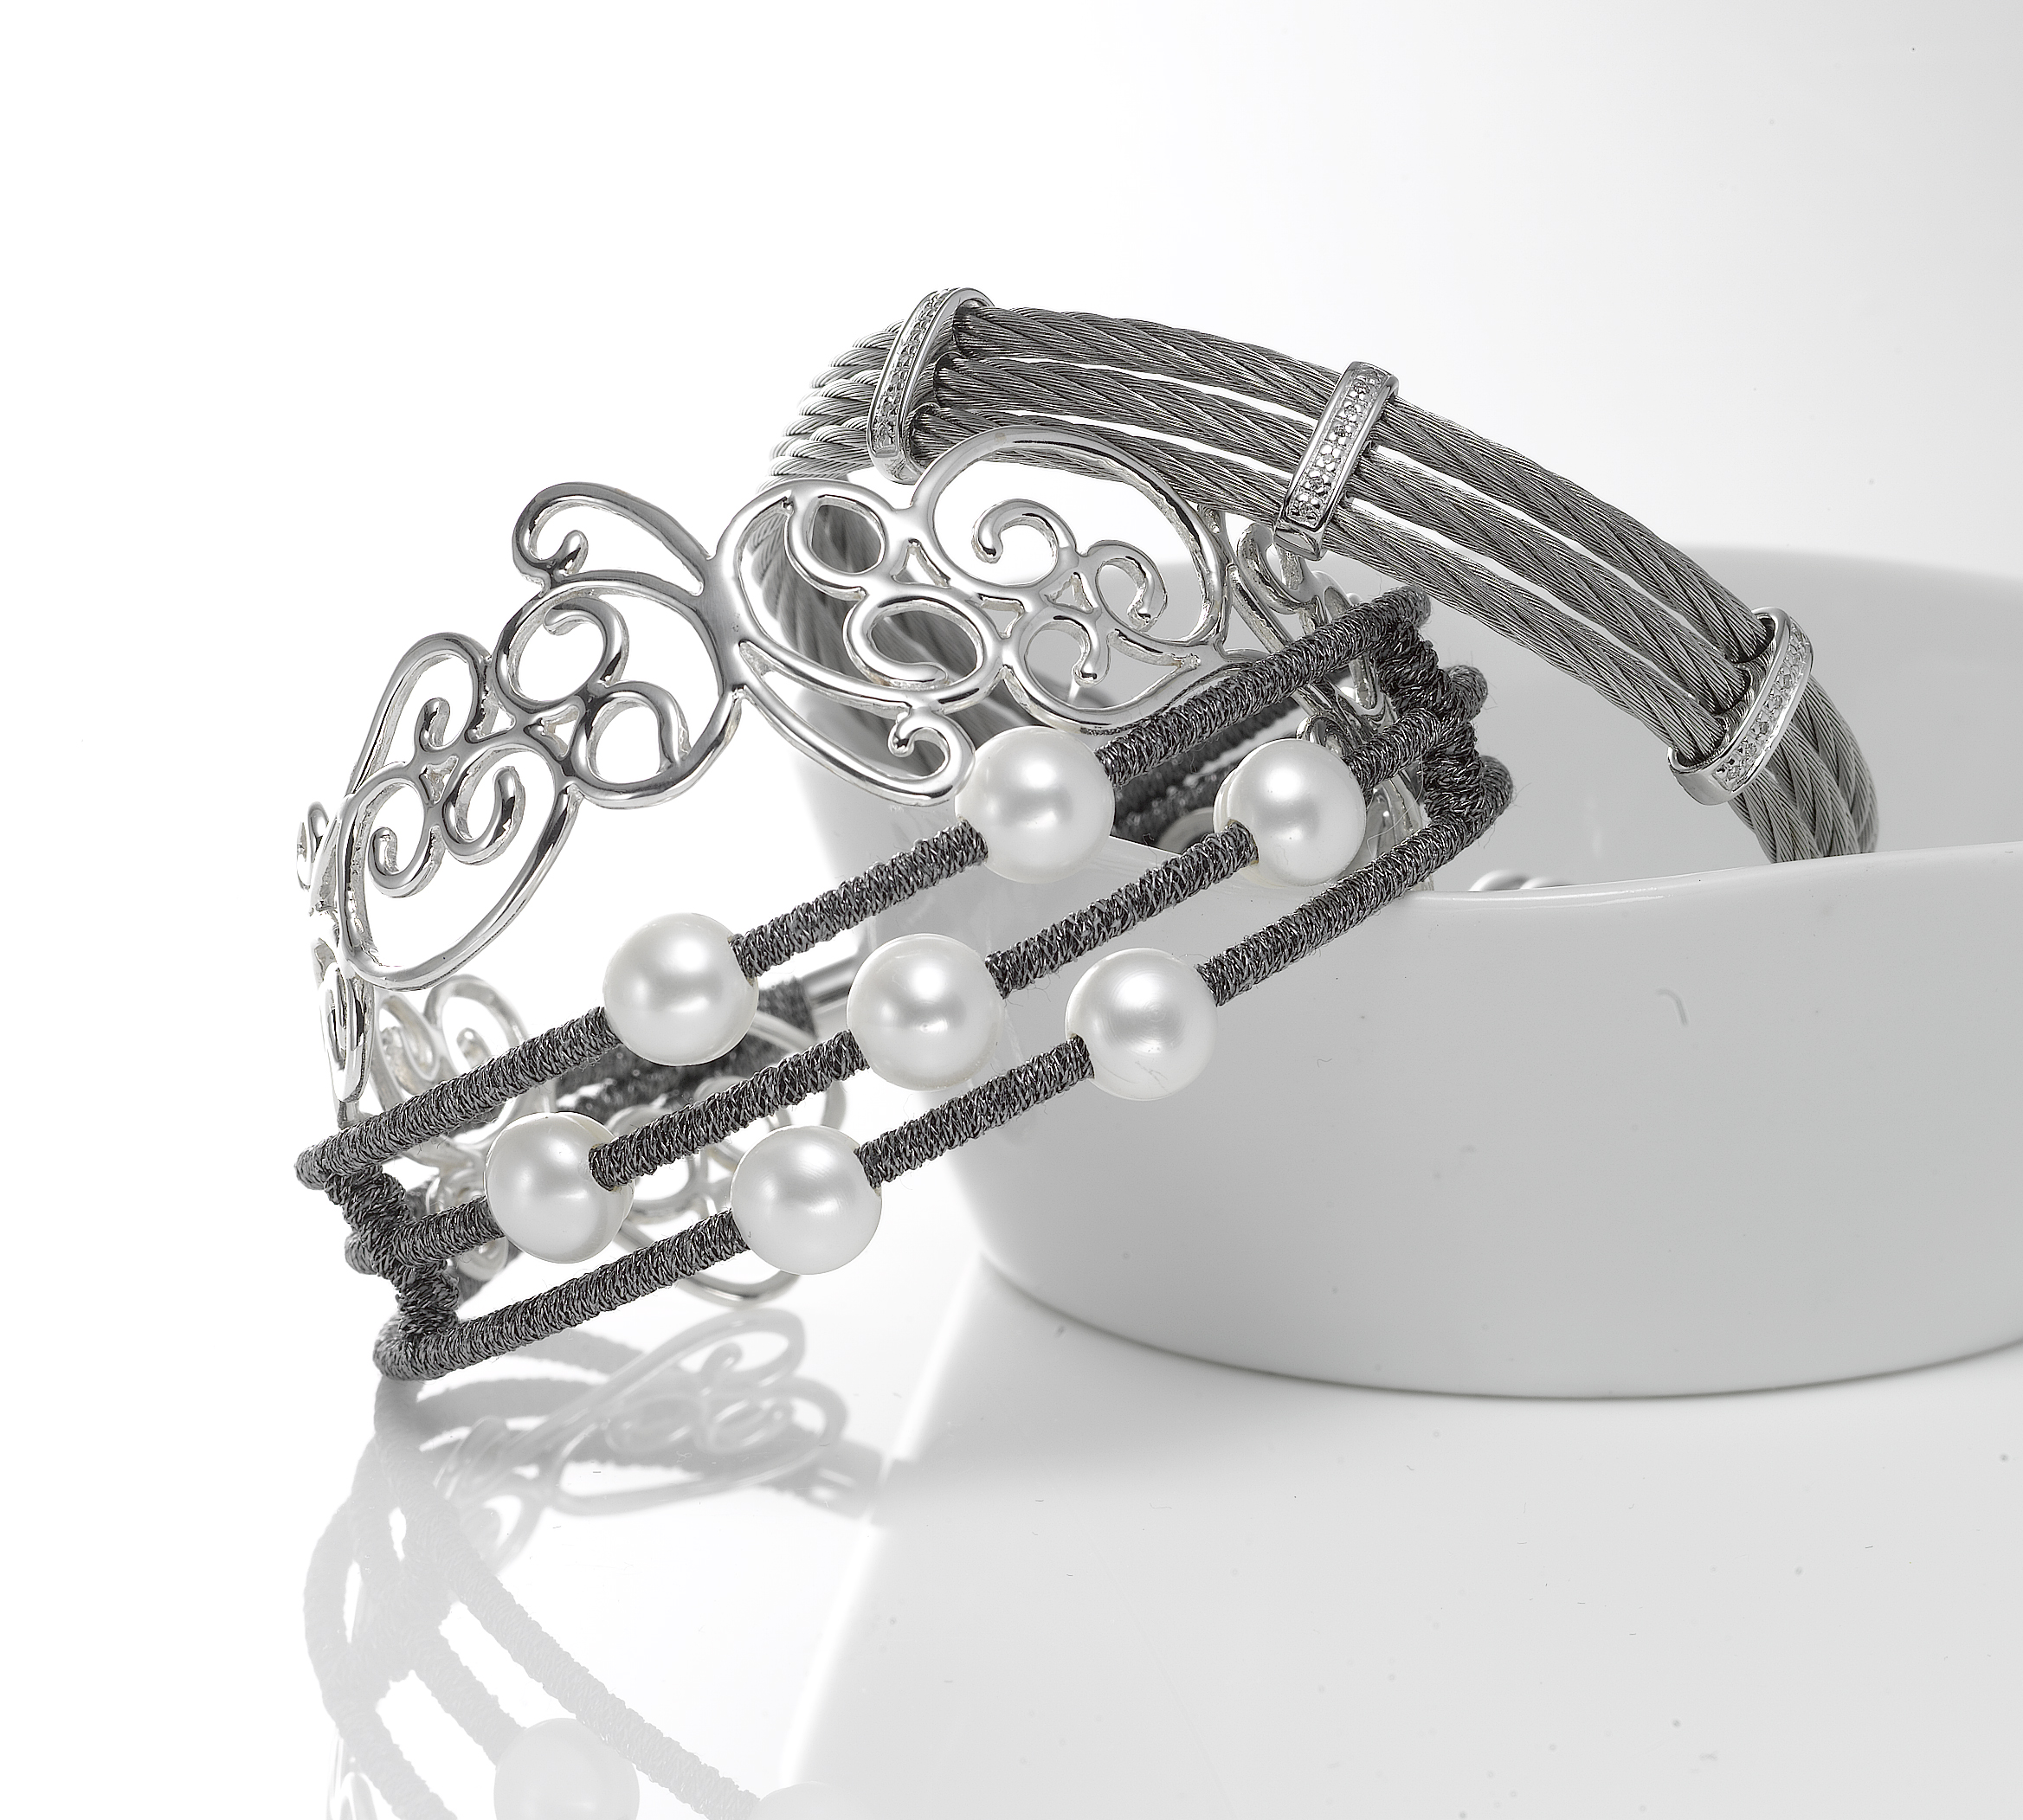 Bracelet_cuffs.jpg